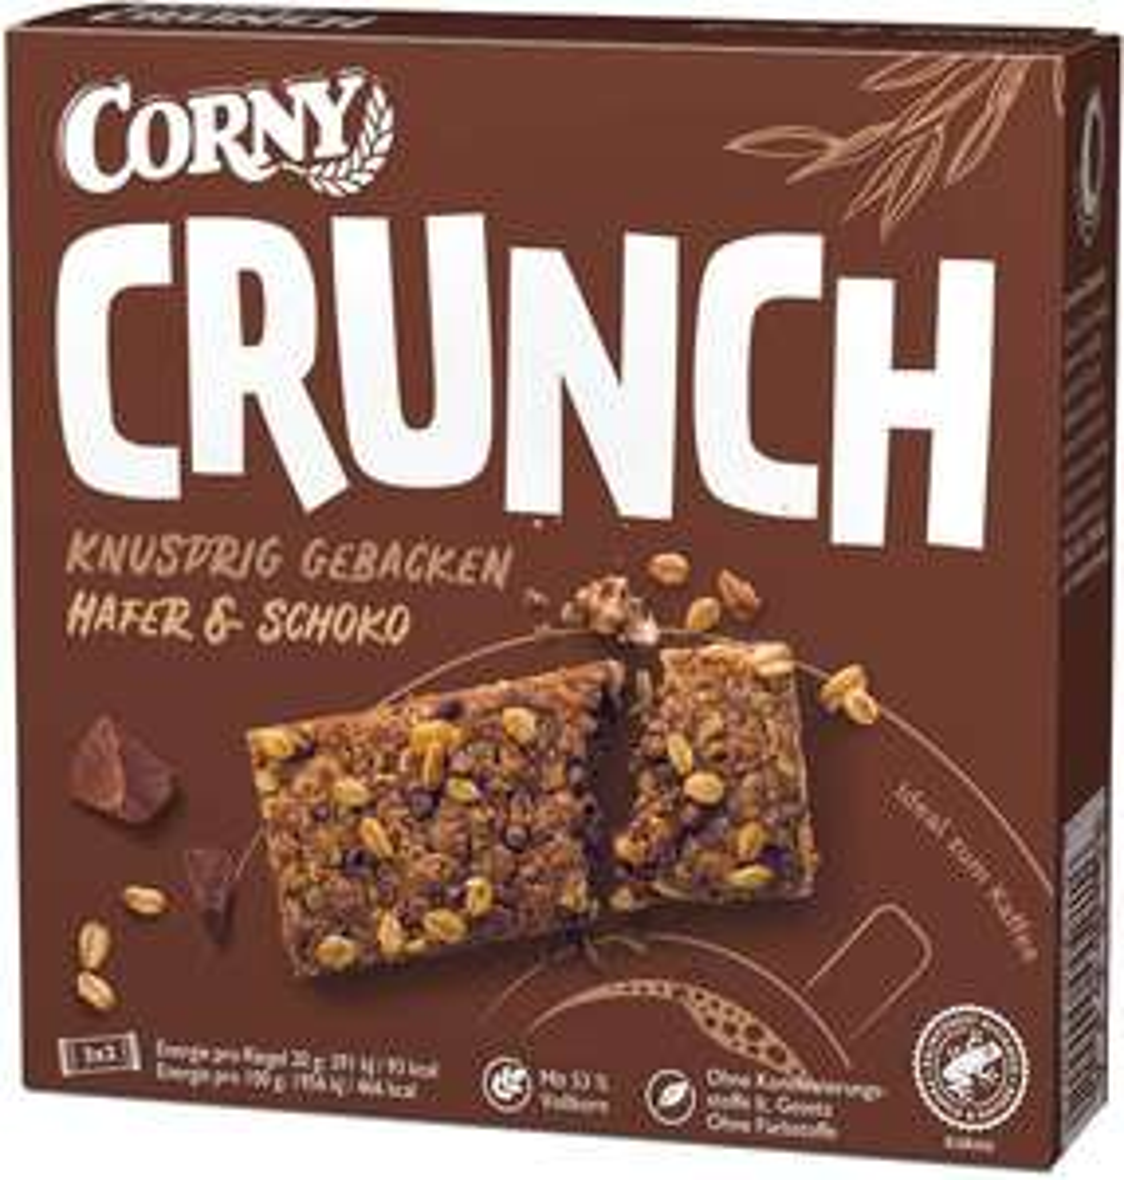 [Prime Sparabo] Corny Tages Angebot, z.B. Corny Crunch Hafer & Schoko, 9 Schachtel mit je 6 Riegeln/120g, (0,90€ pro Packung)